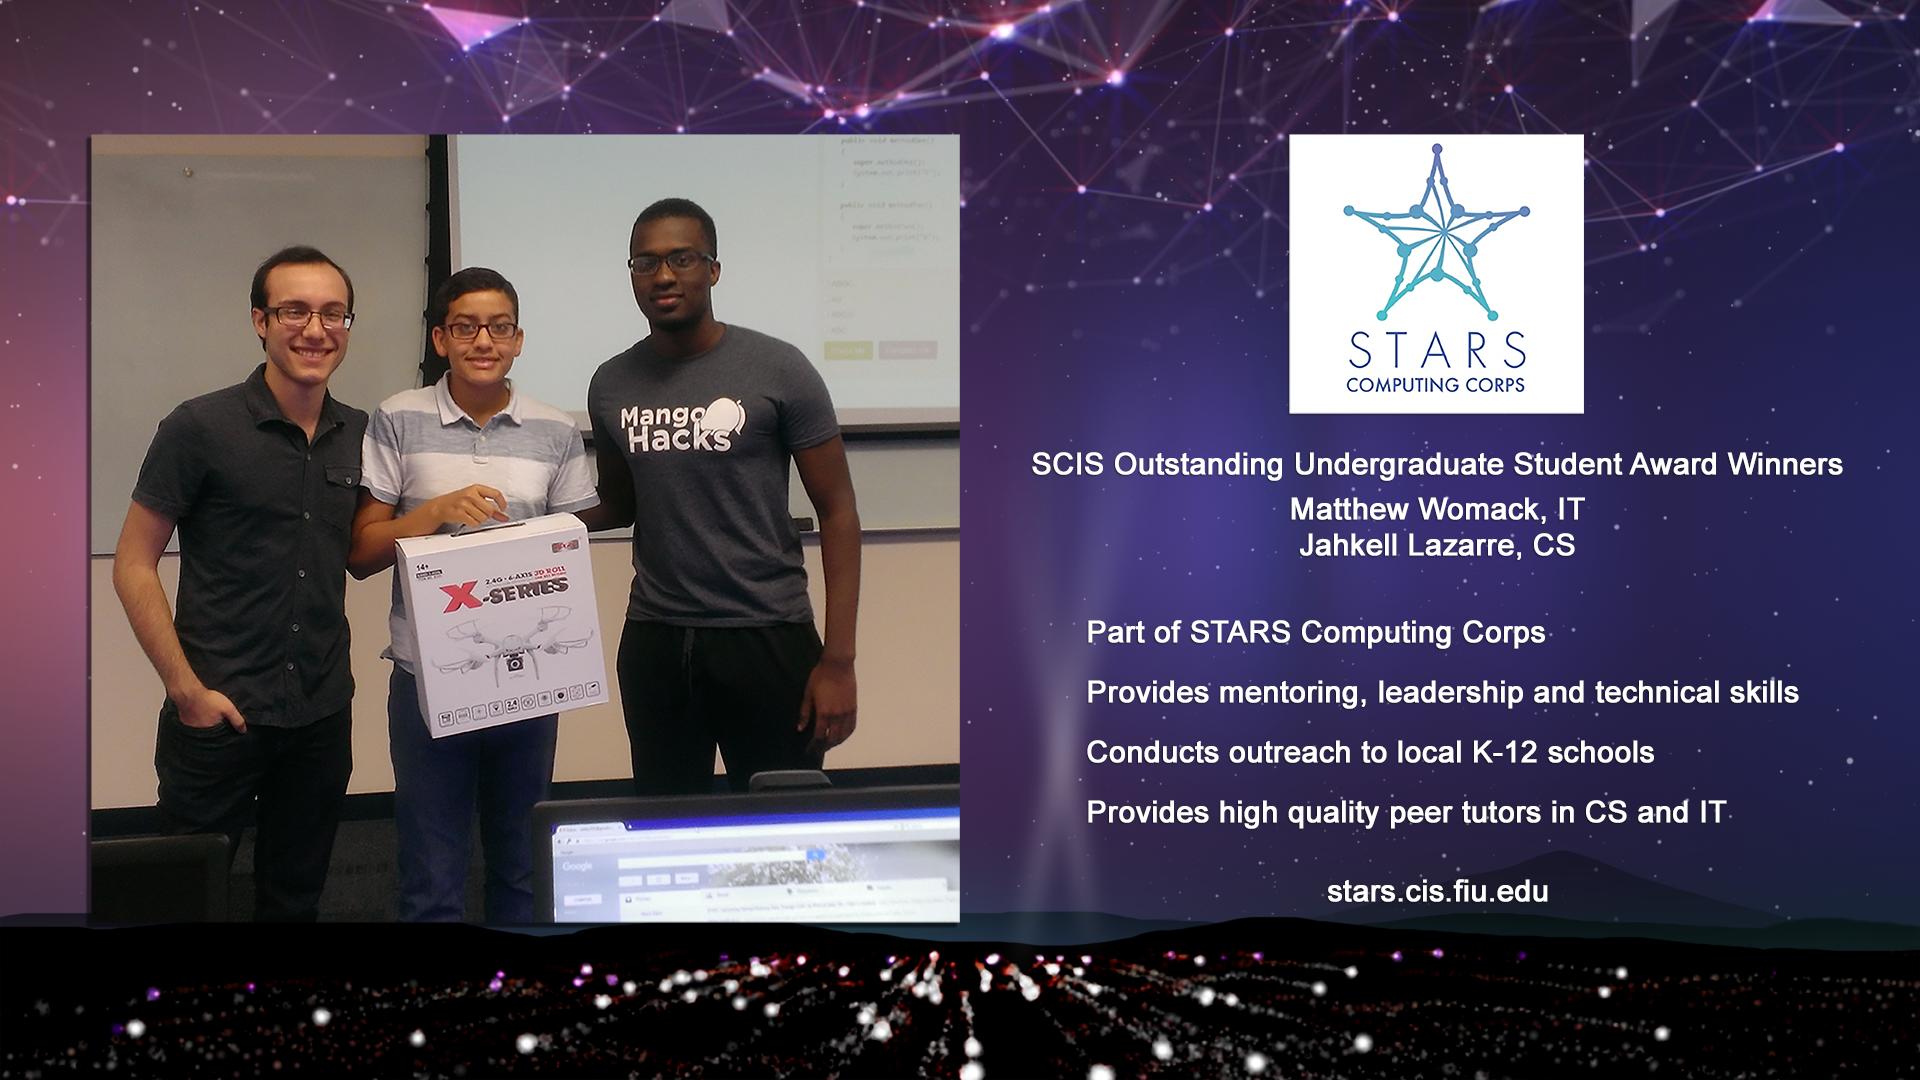 stars-achievements-digital-sign